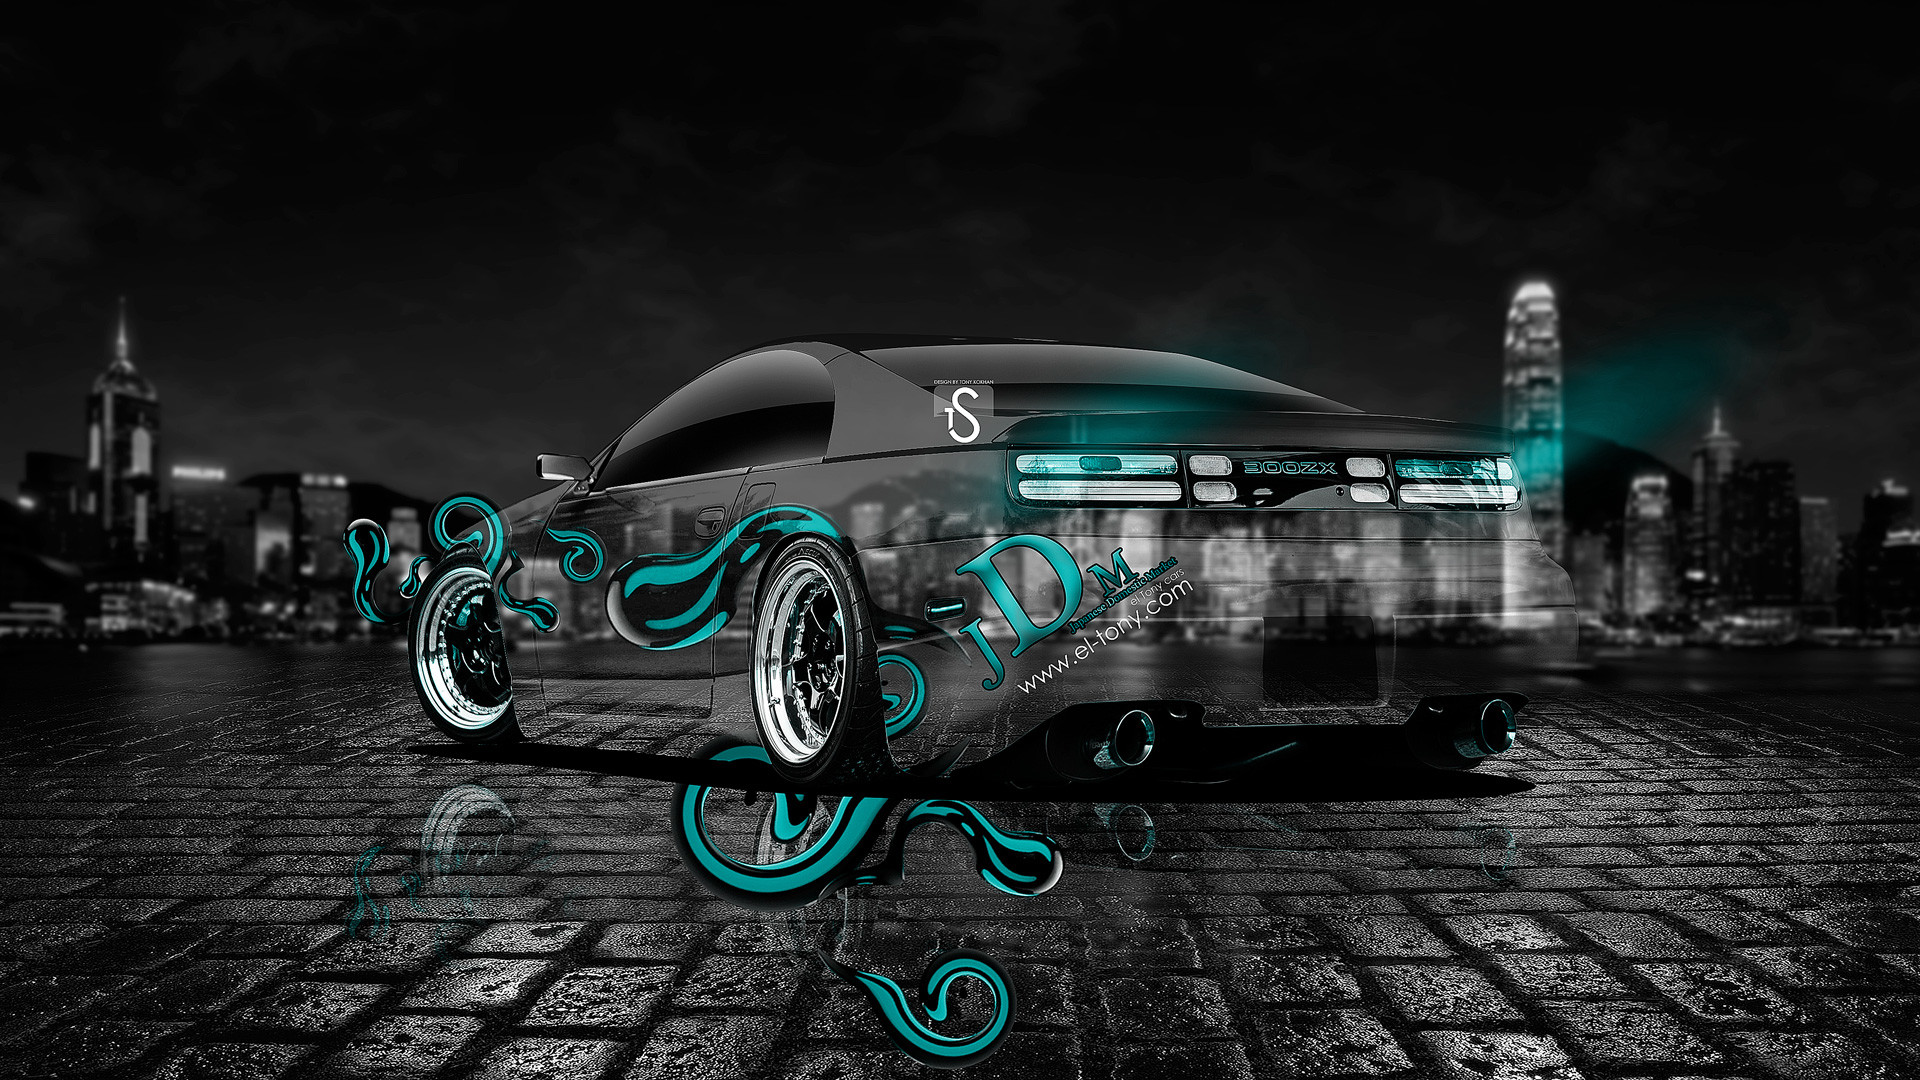 Nissan-300ZX-JDM-Azure-Crystal-Effects-Car-2013- …